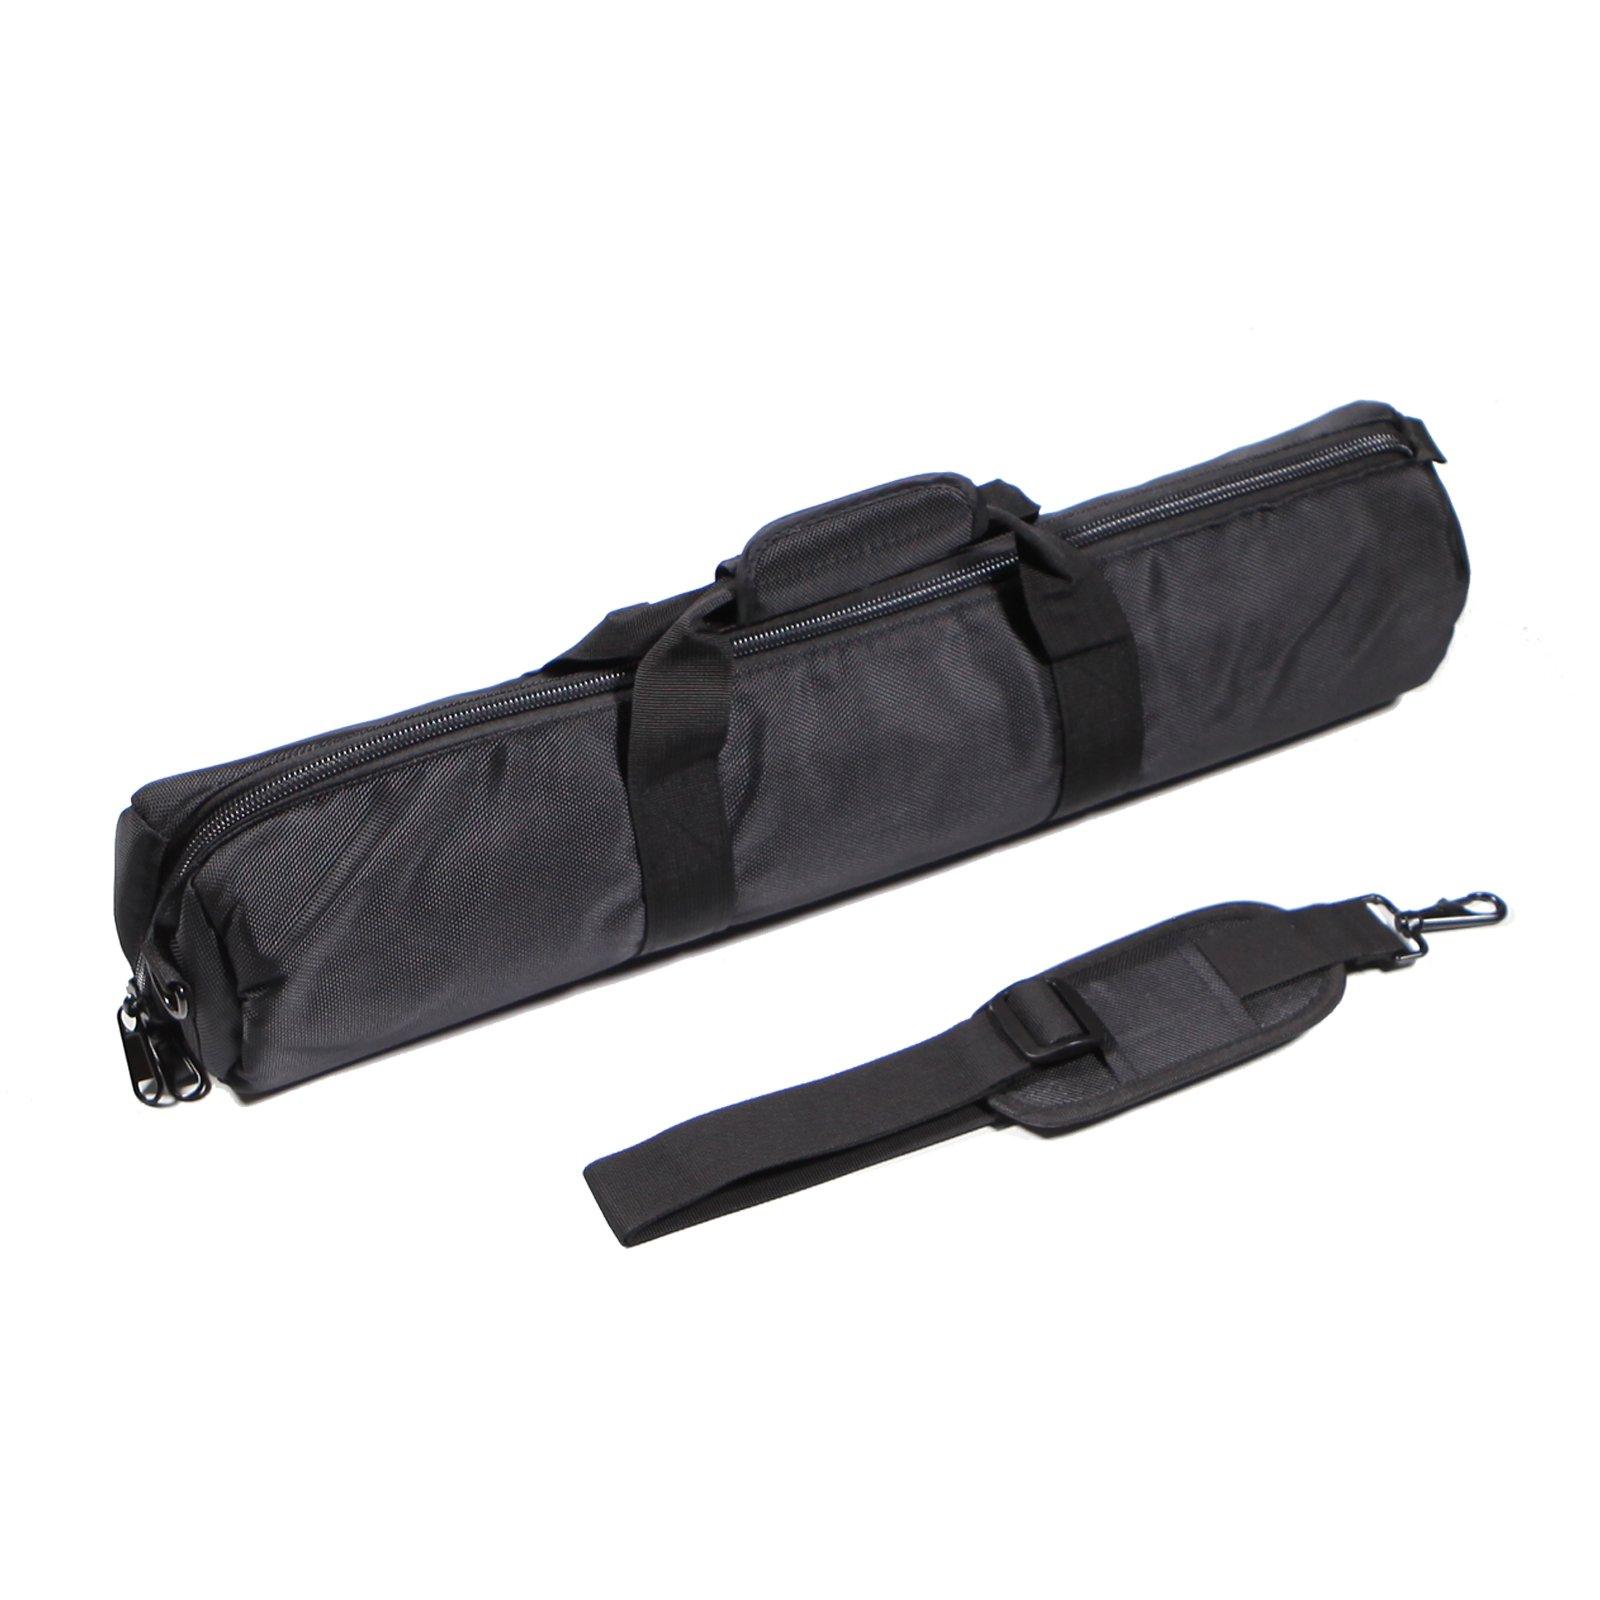 Meking 30''/75cm Padded Tripod Zipper Case Bag with Shoulder Strap by Meking (Image #3)